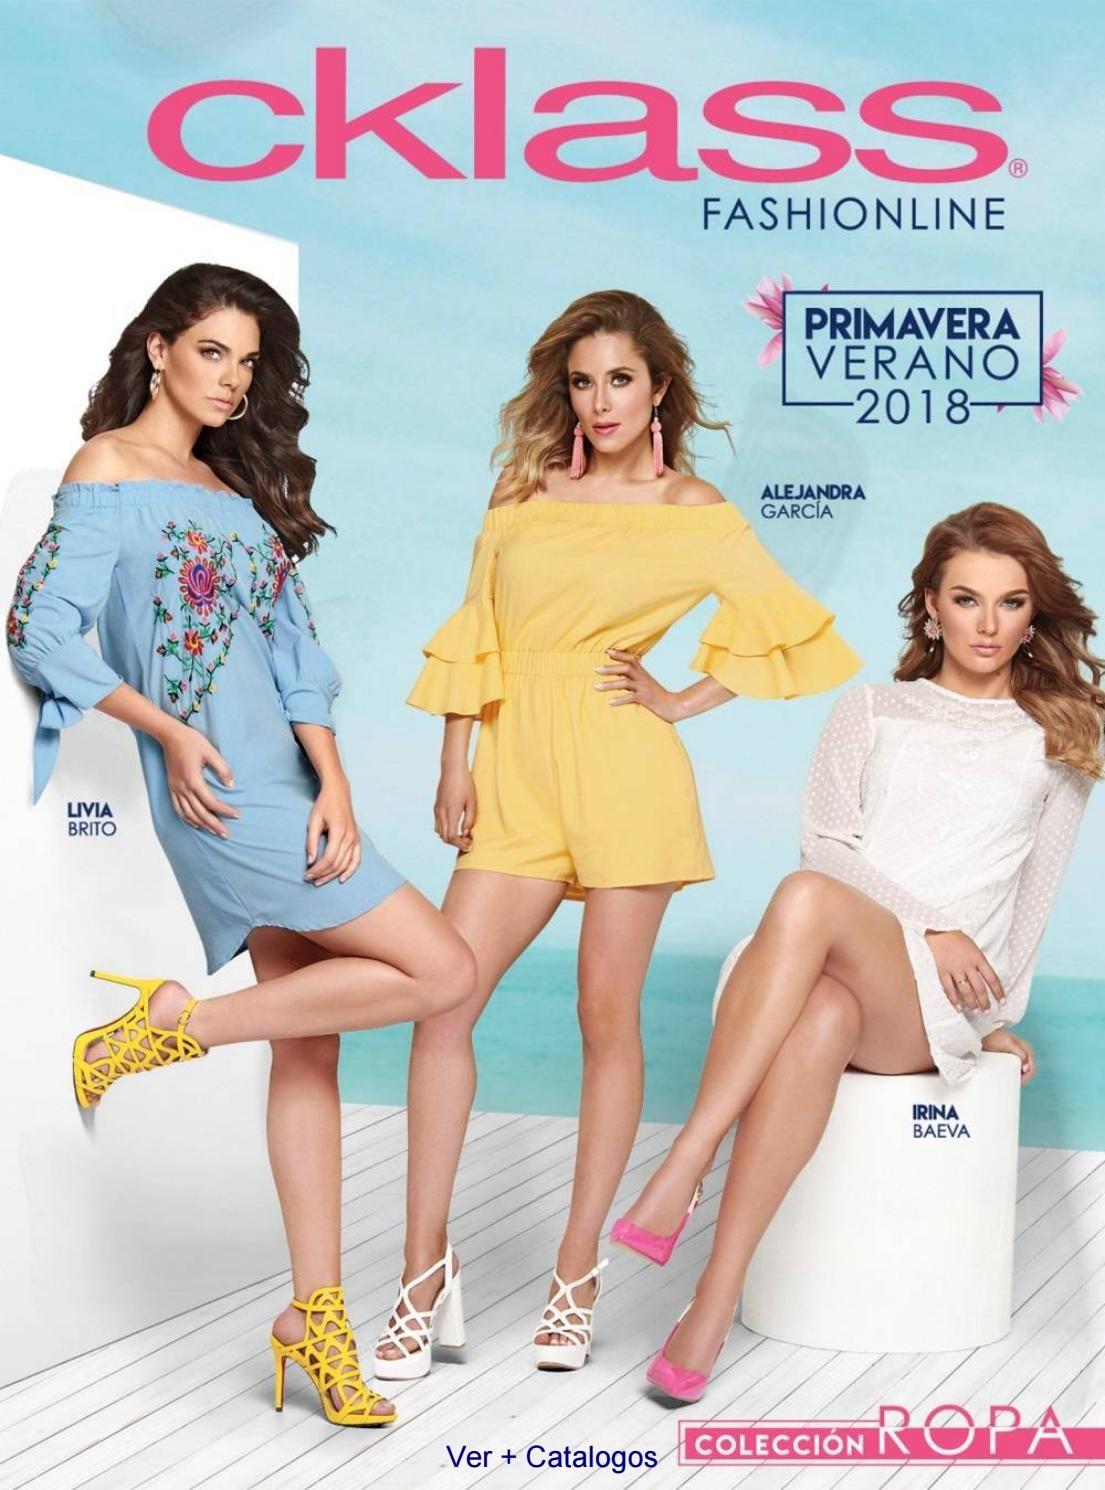 Ropa Ck Pv18 Fashion Peplum Dress Cover Up